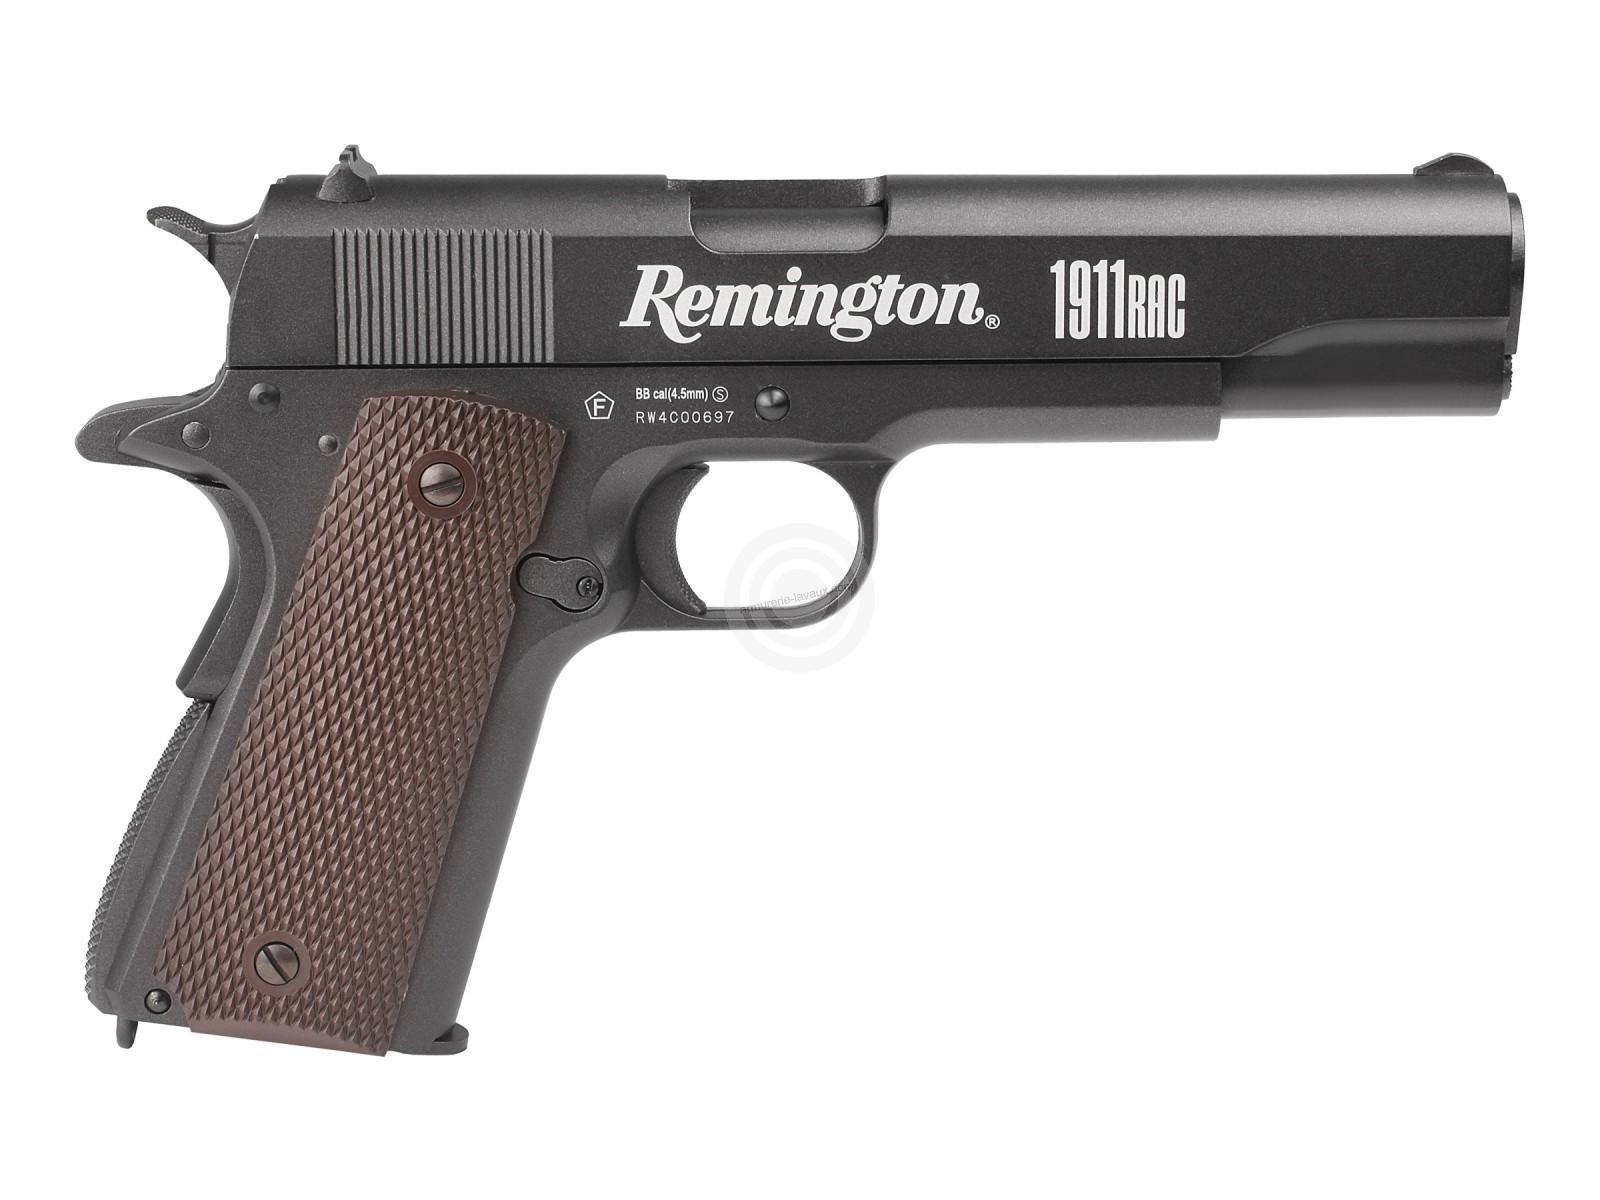 Pistolet REMINGTON 1911 RAC cal.4,5mm Bbs